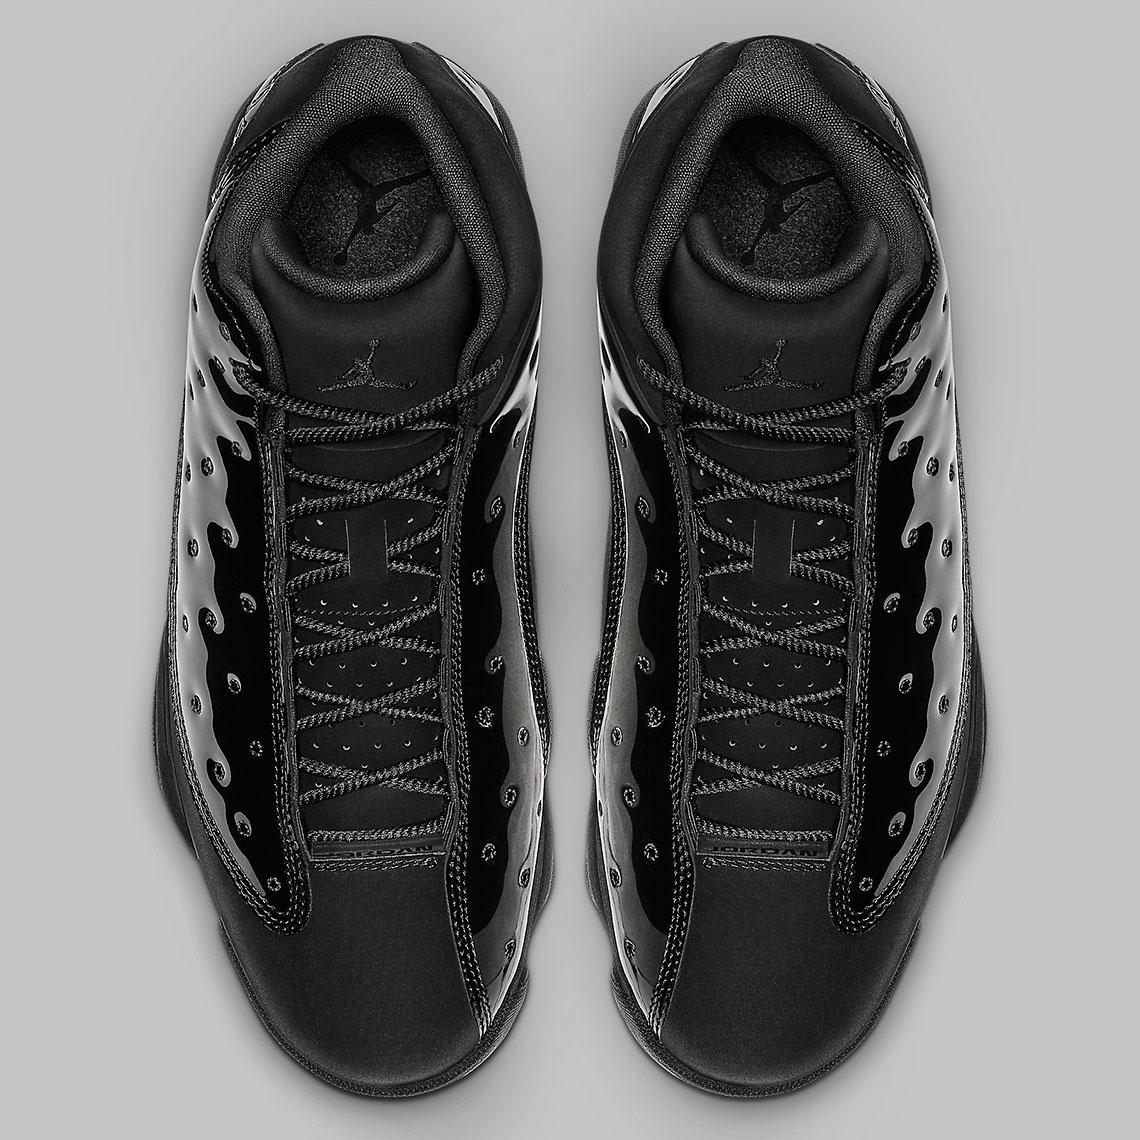 fc85d24c01c Air Jordan 13 Cap And Gown 414571-012 Store List | SneakerNews.com